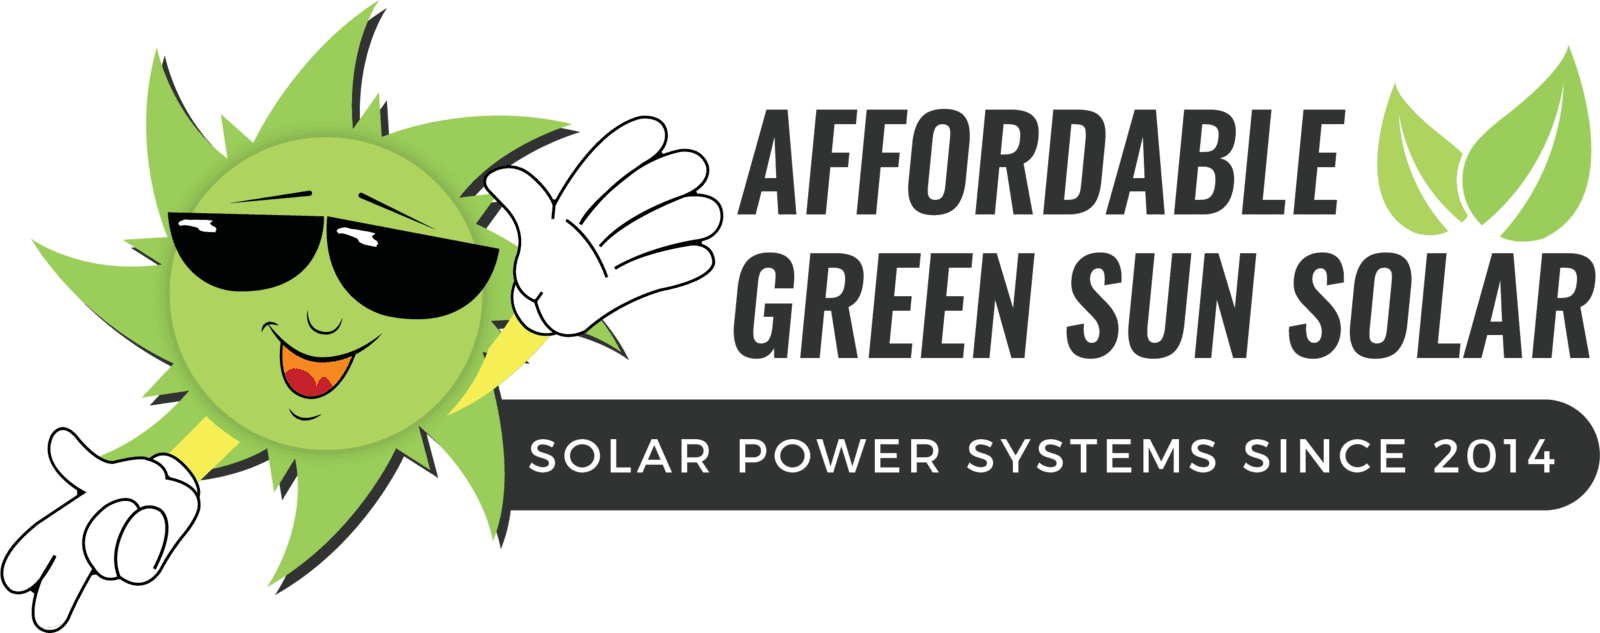 Affordable Green Sun Solar